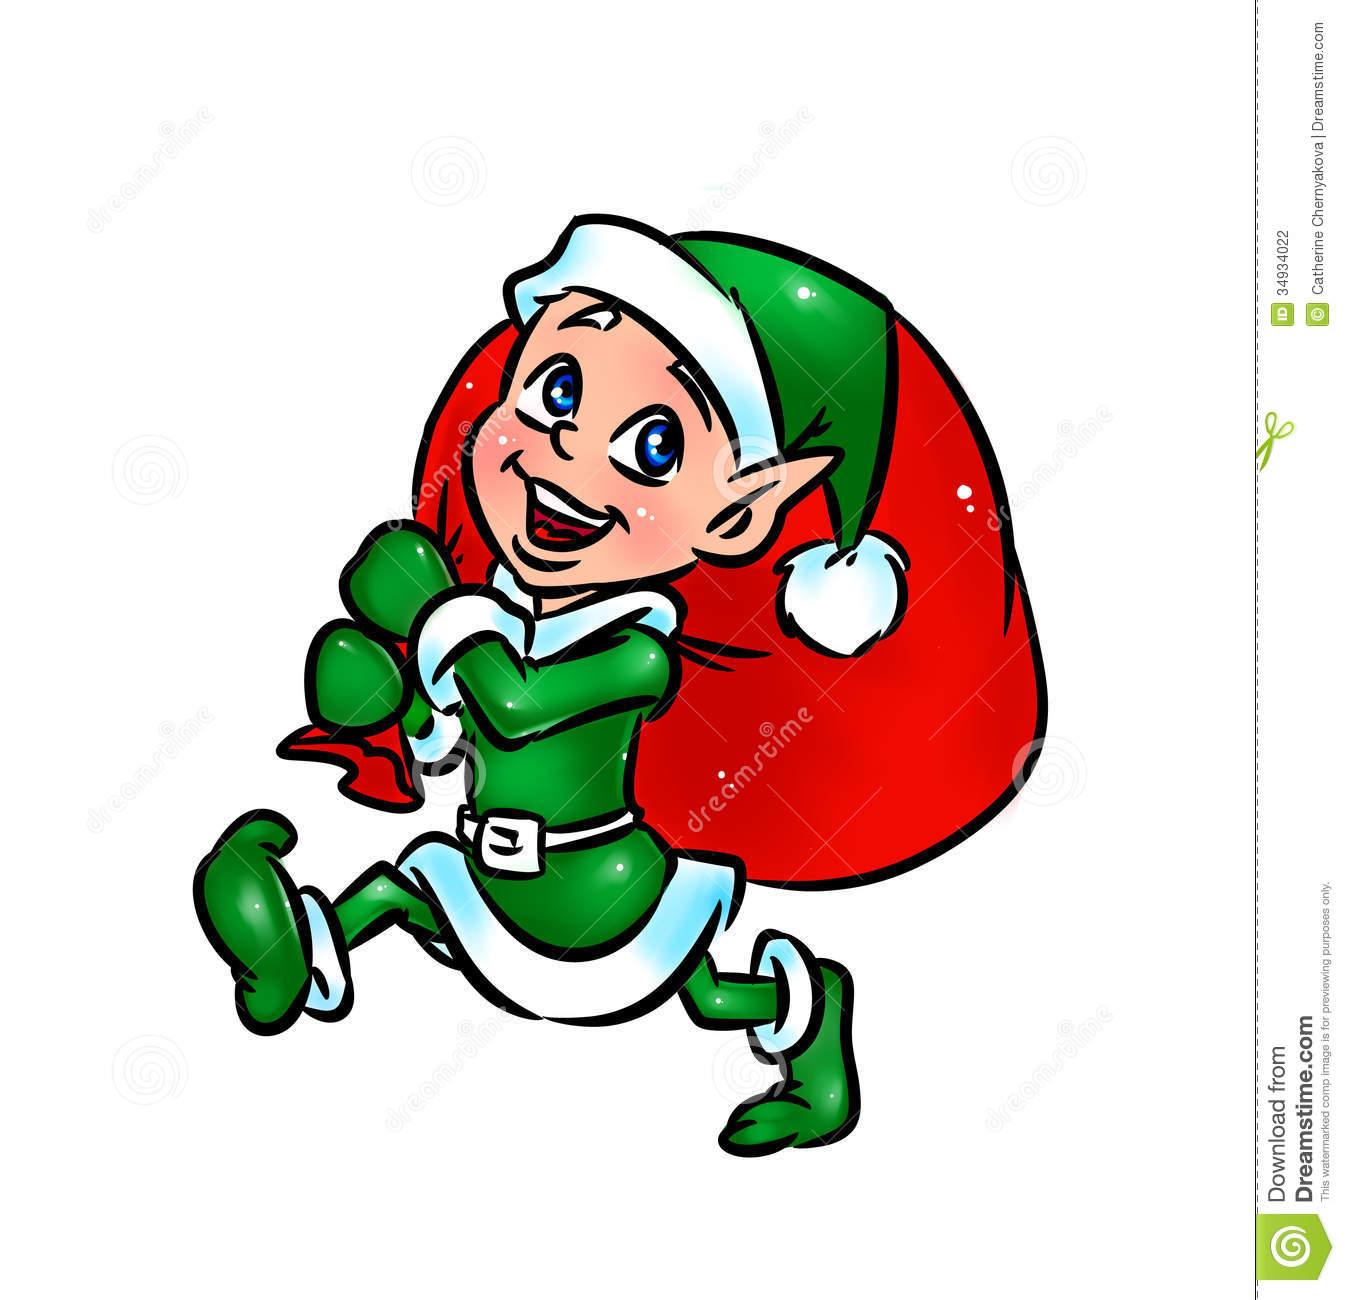 Danse clipart snowman  Cartoon Clipart Christmas Clipart